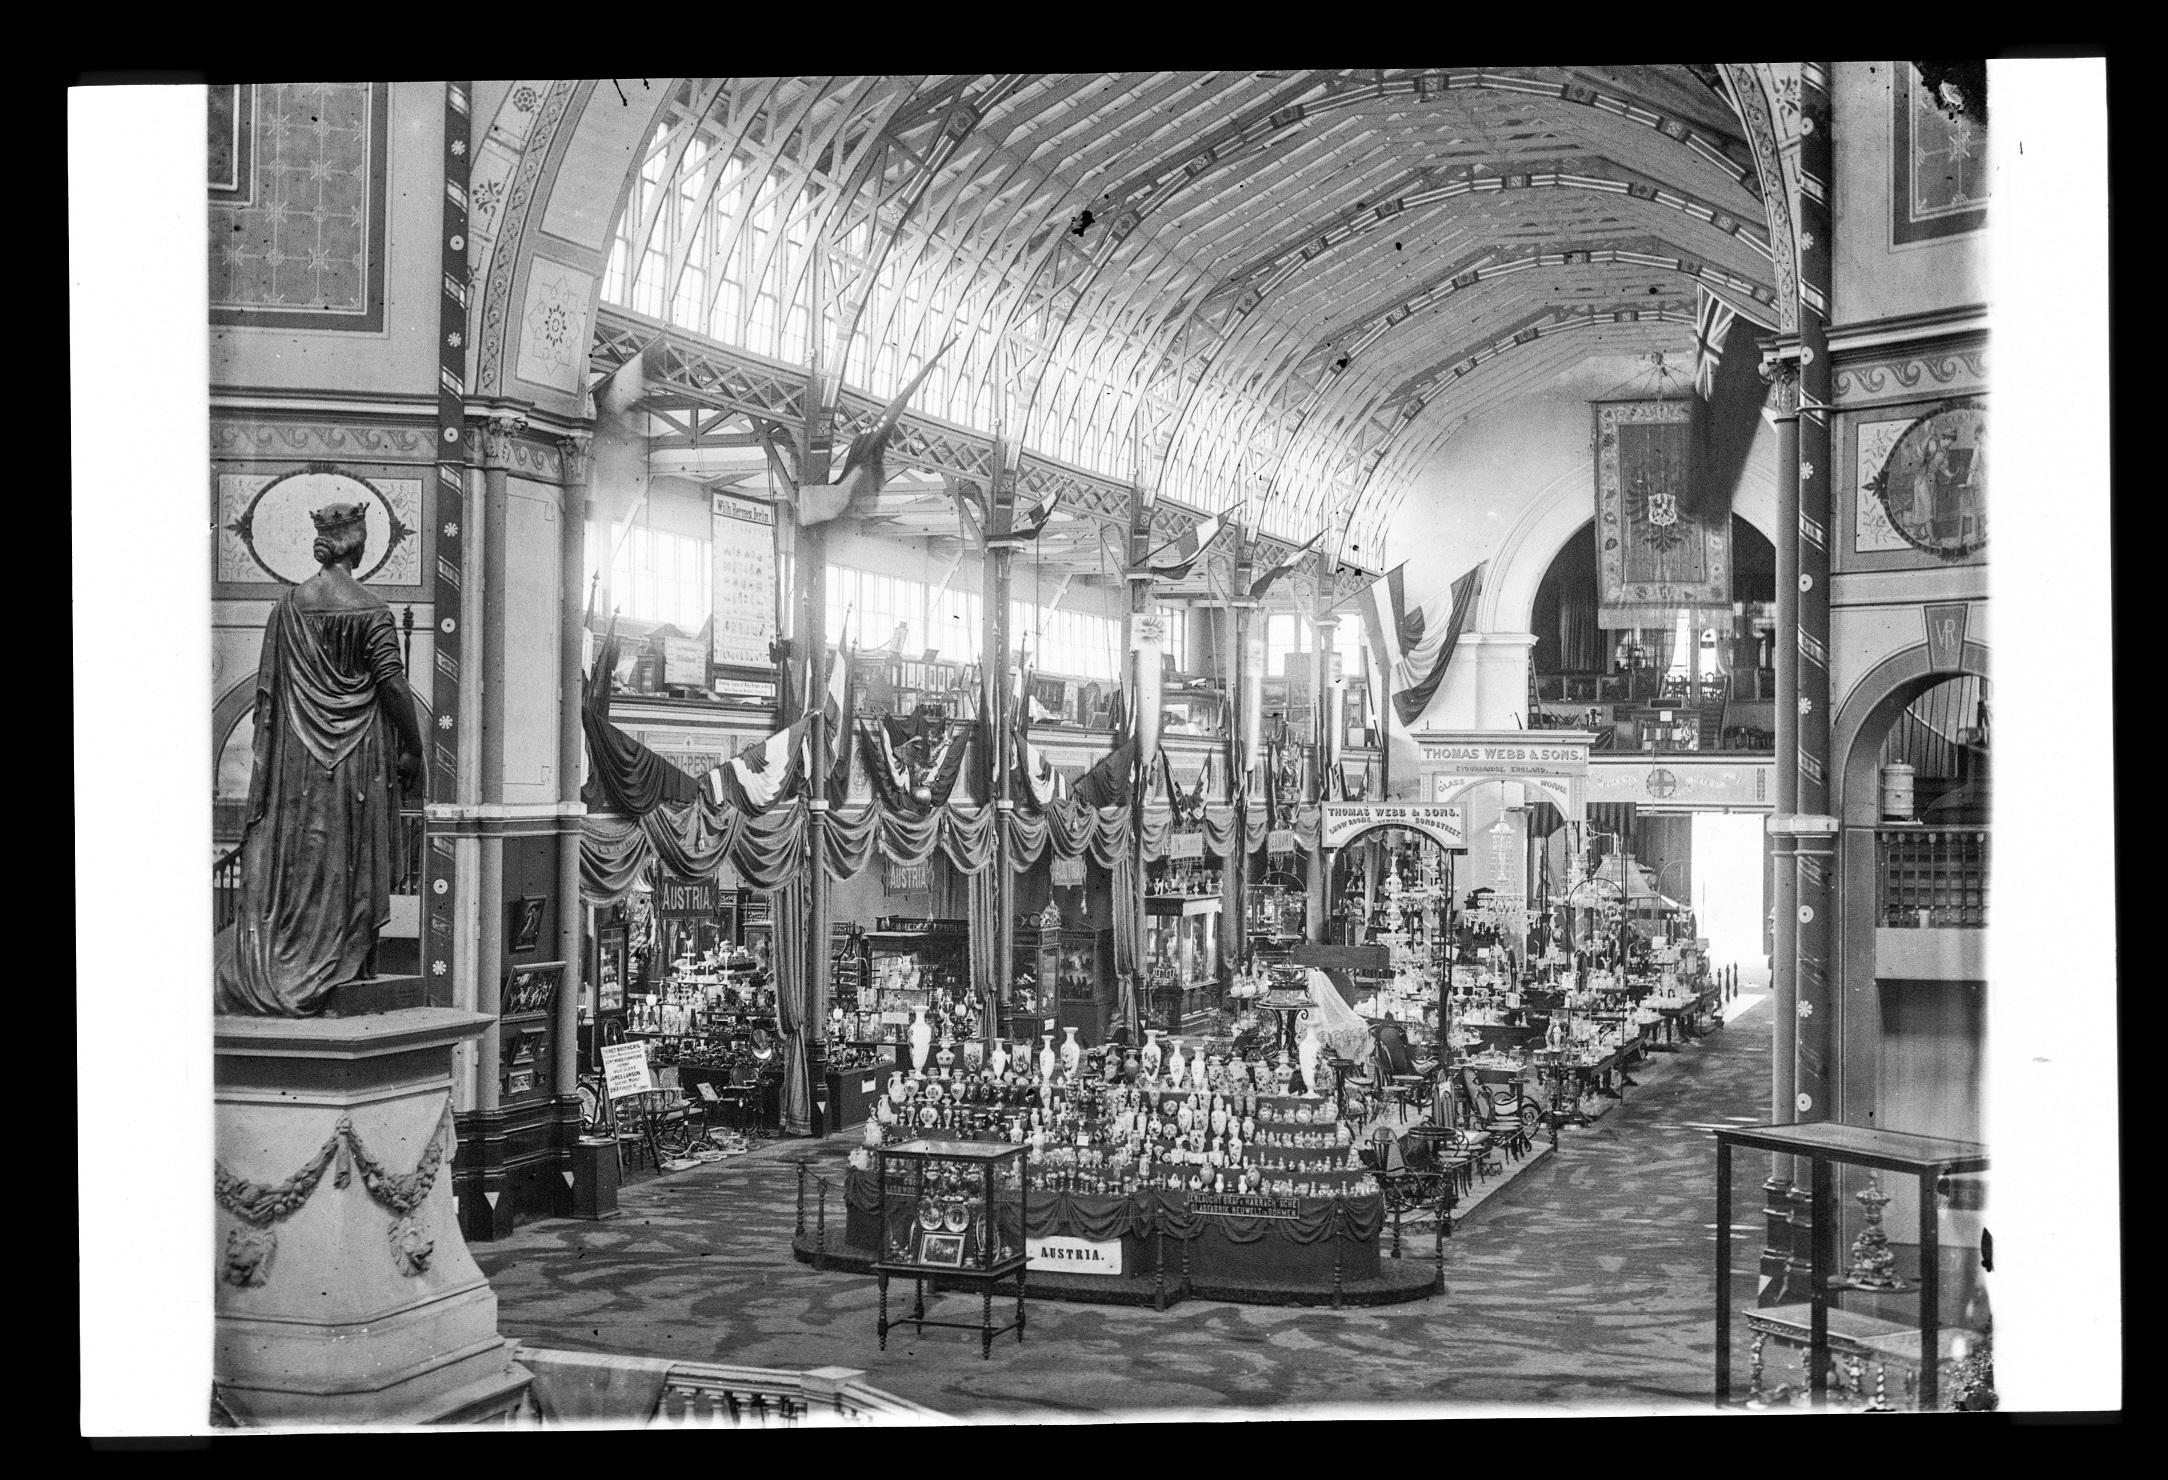 International Exhibition, Sydney, 1879-80: hall of exhibits